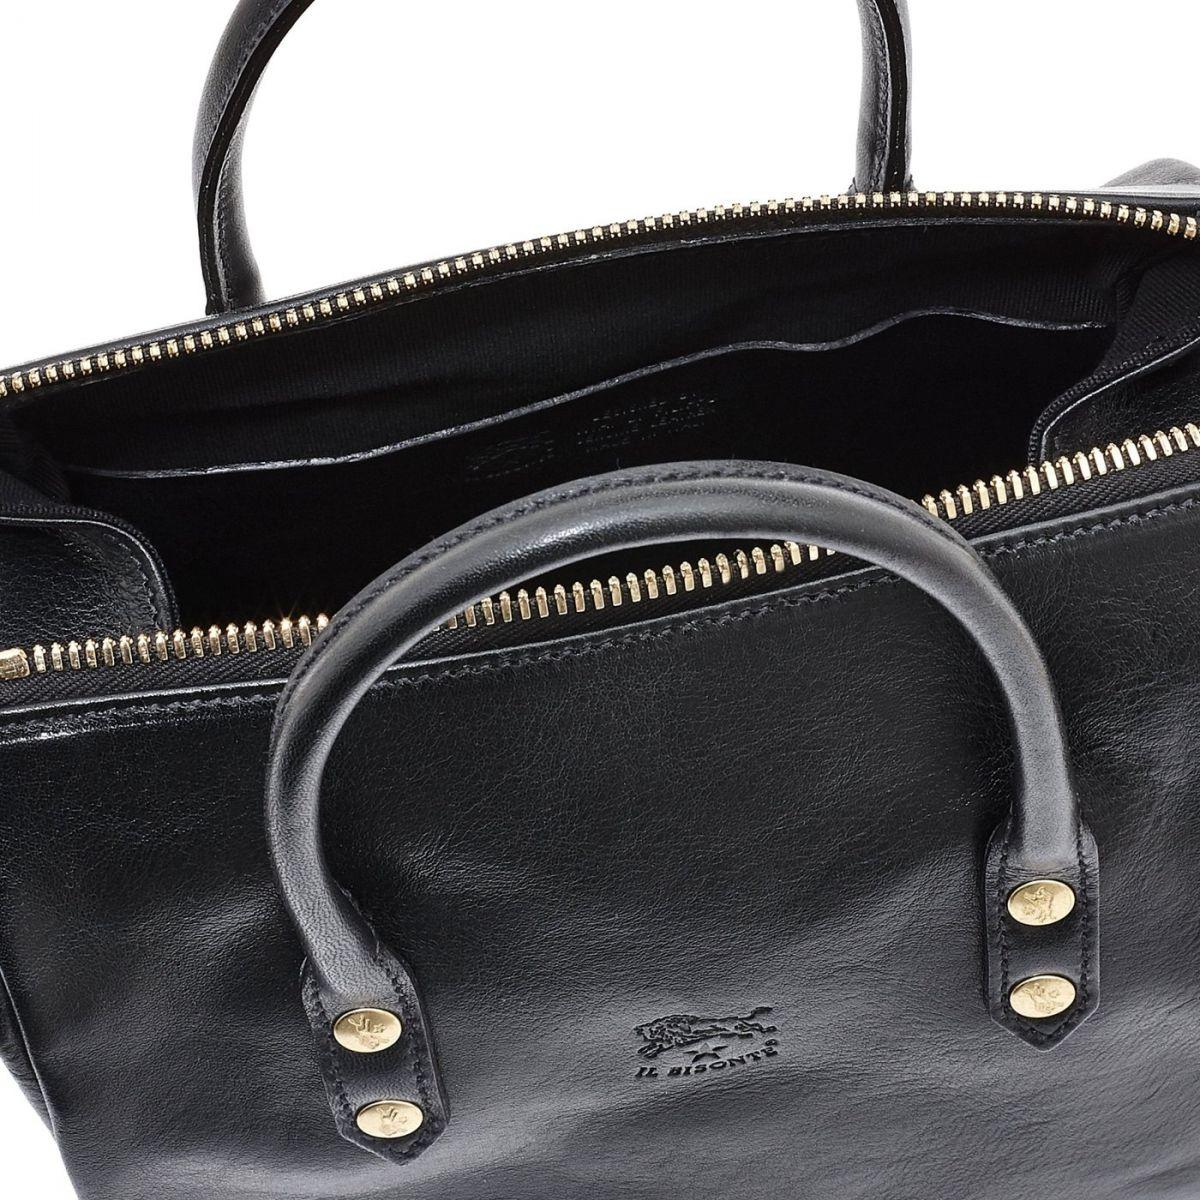 Women's Handbag Pratolino in Cowhide Double Leather BTH049 color Black | Details